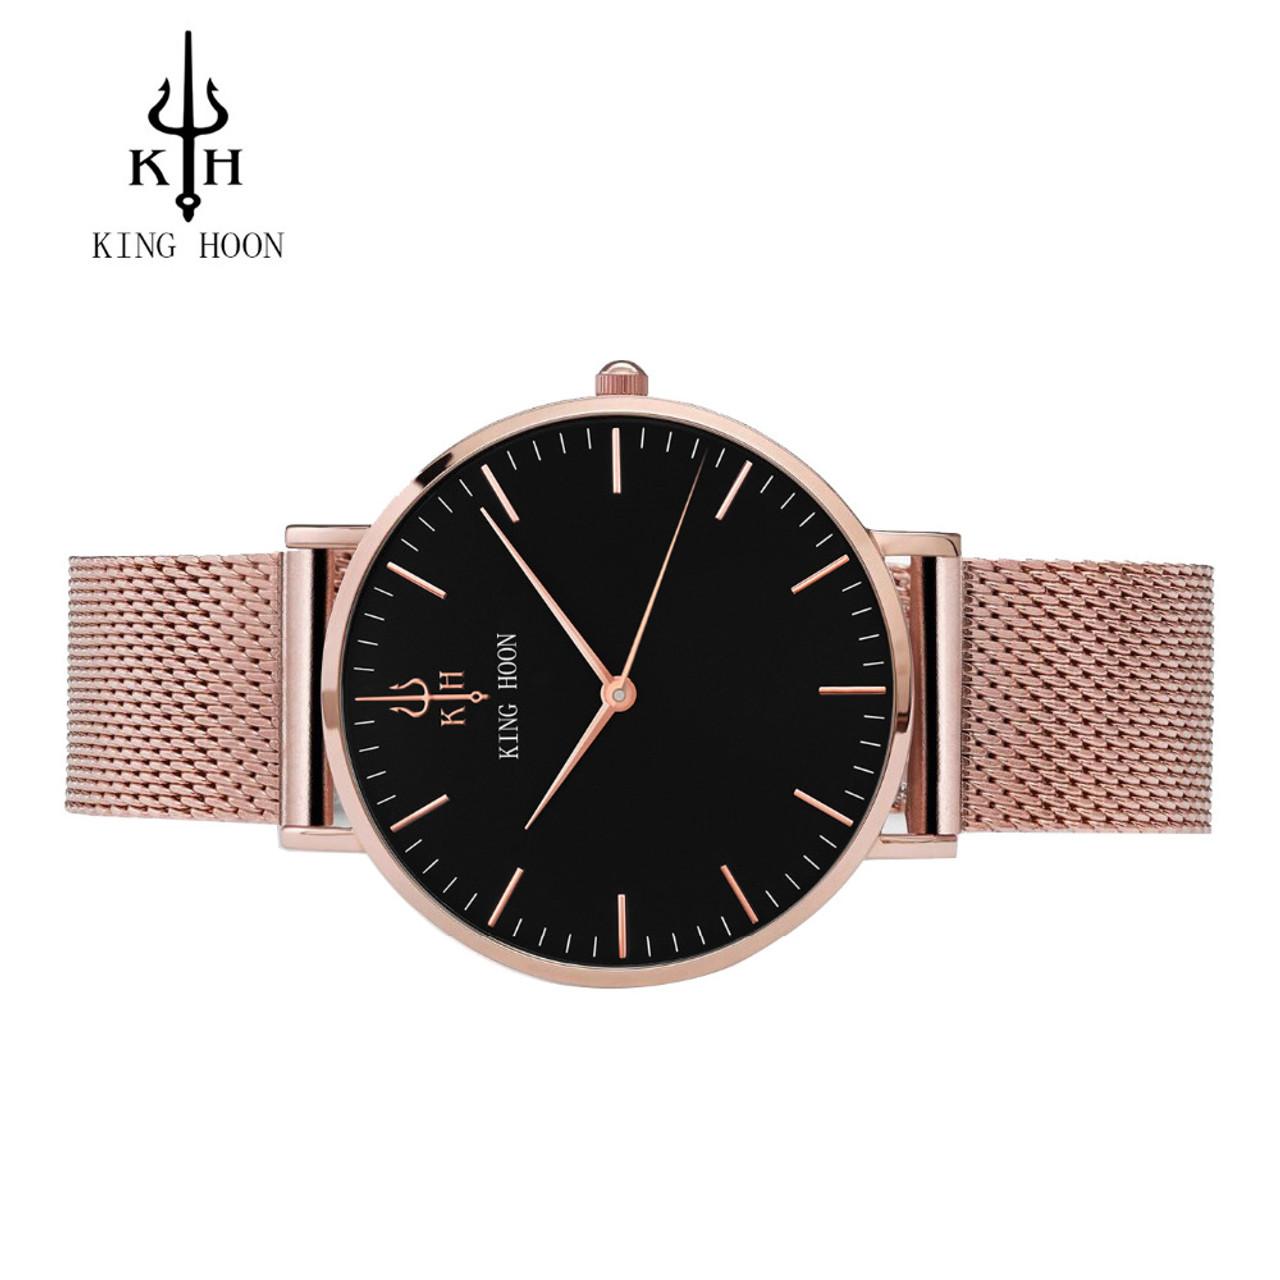 4732489dcd1 ... KING HOON Women Watches Luxury Brand Fashion Quartz Ladies Stainless  Steel Bracelet Watch Casual Clock montre ...